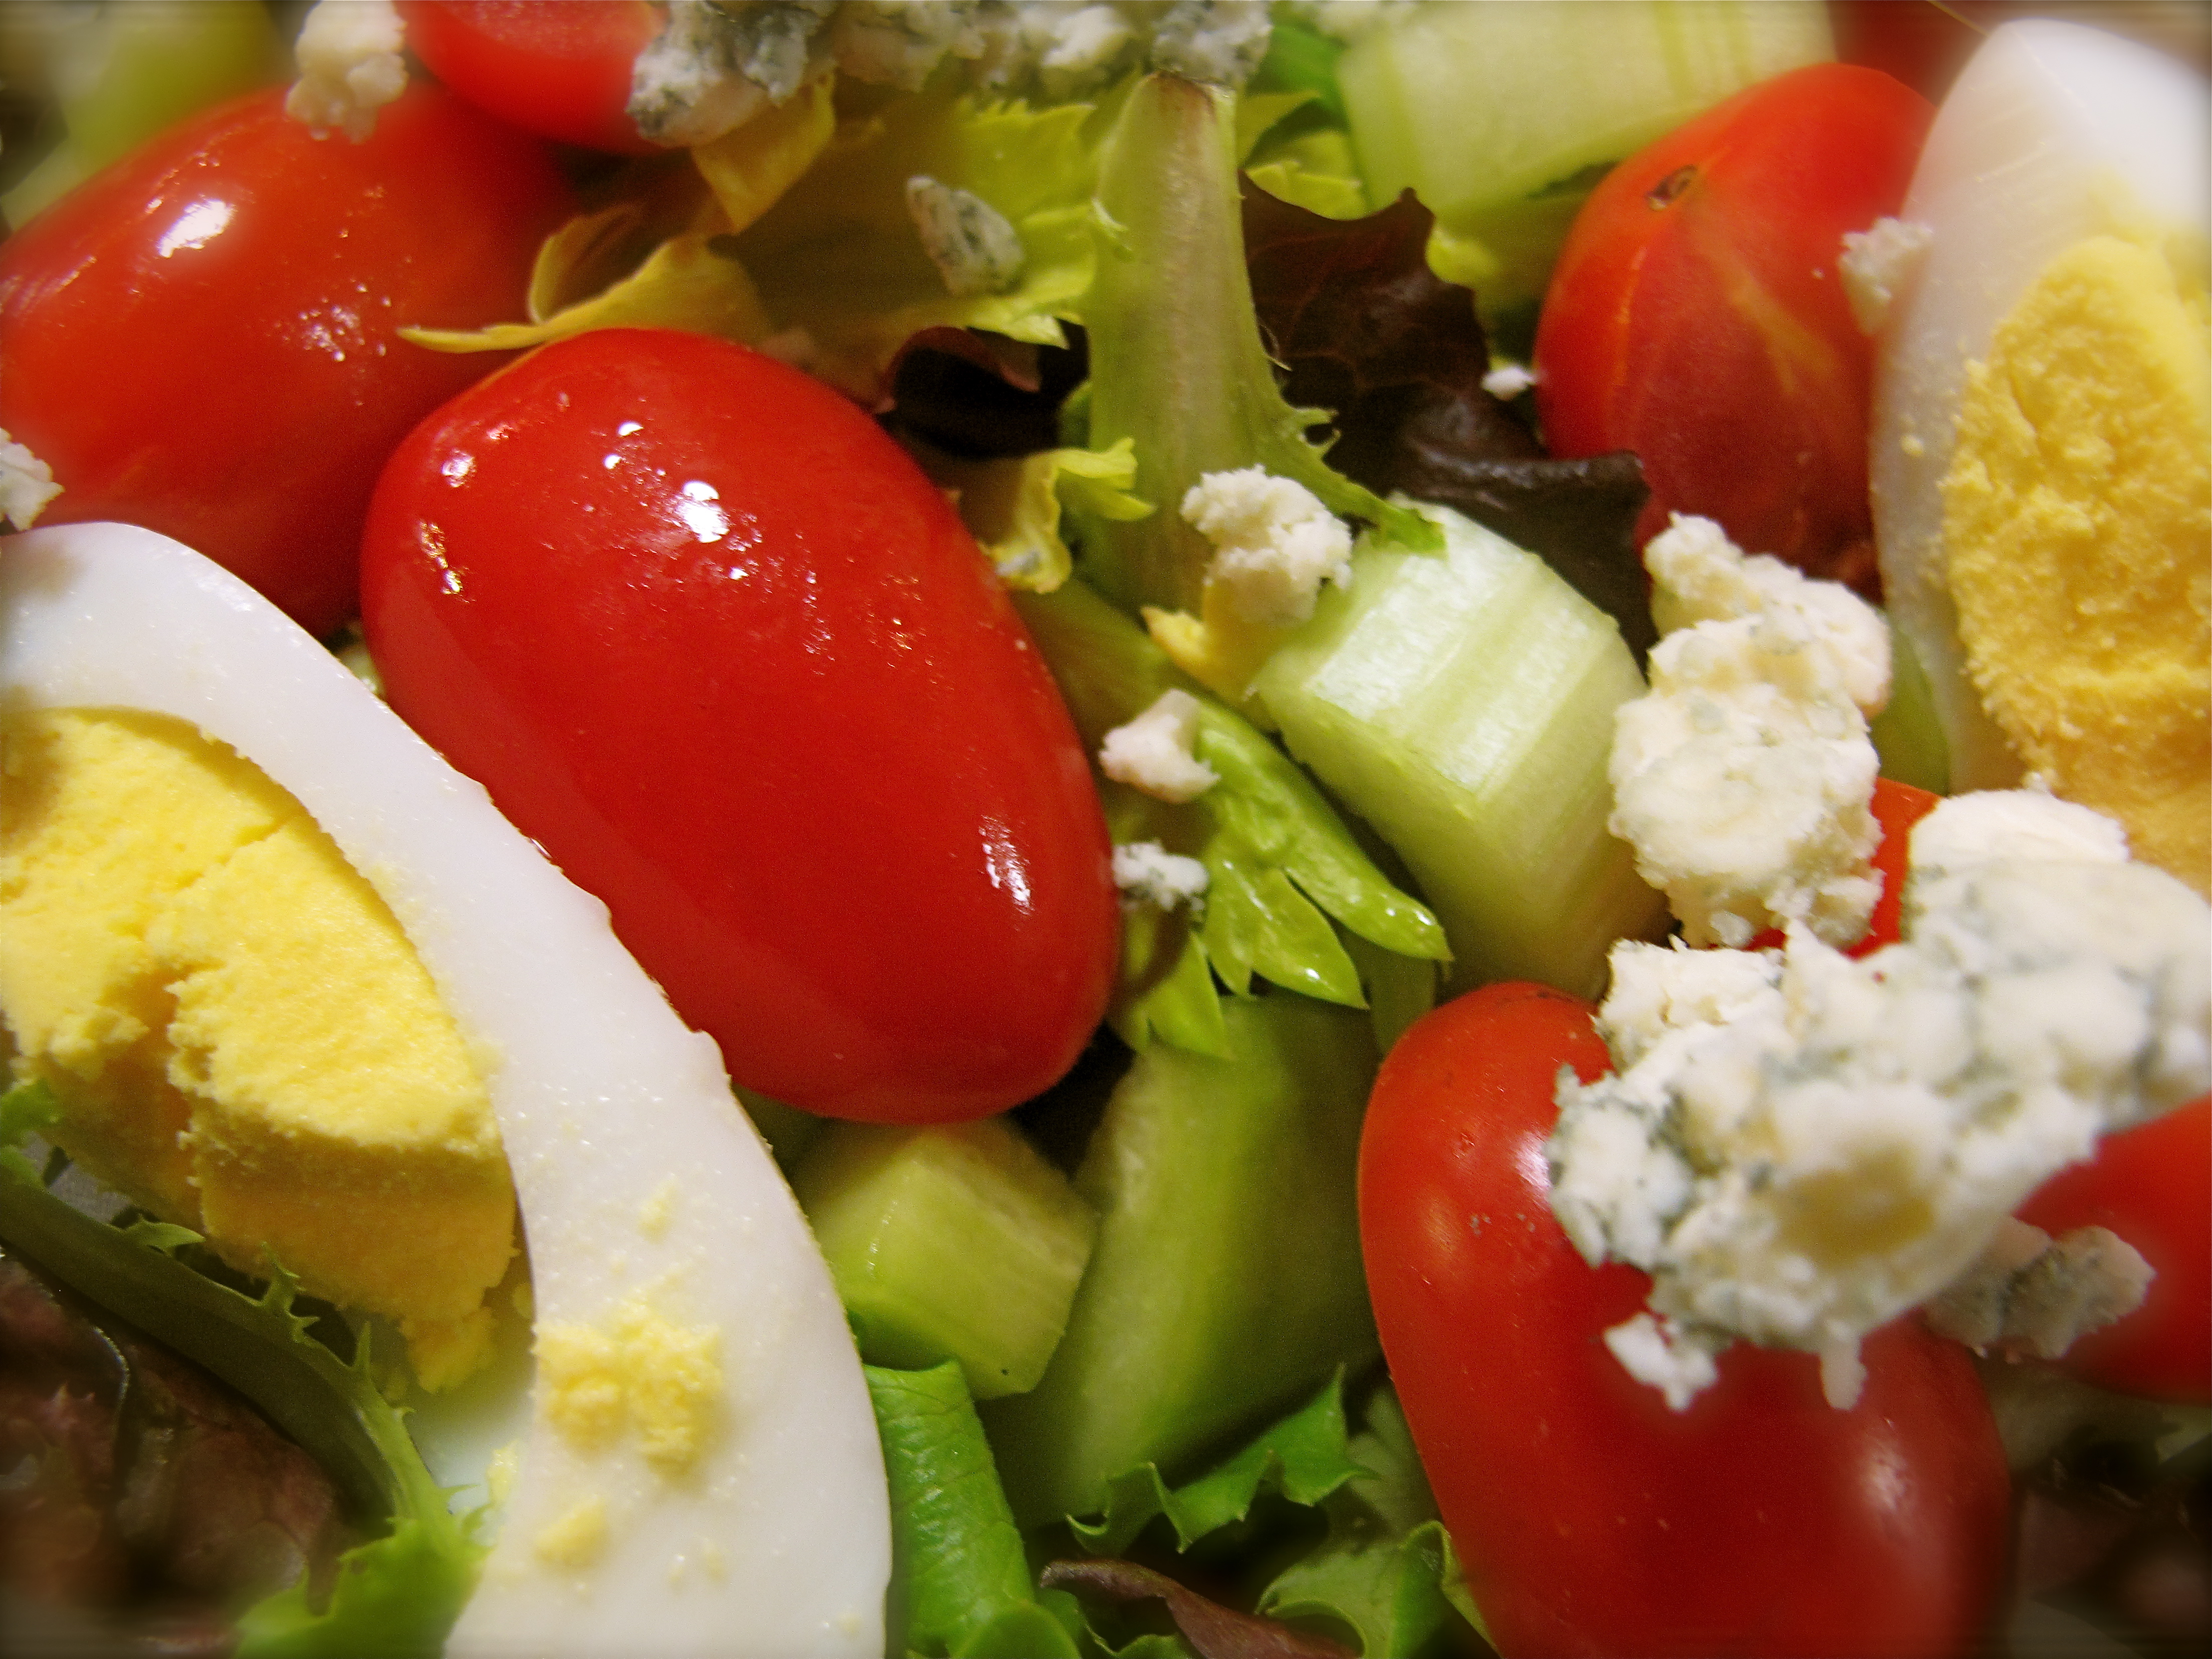 Peasant Salad w/Feta, Cukes, Tomatoes, Oregano, Basil Leaves, Crisp ...